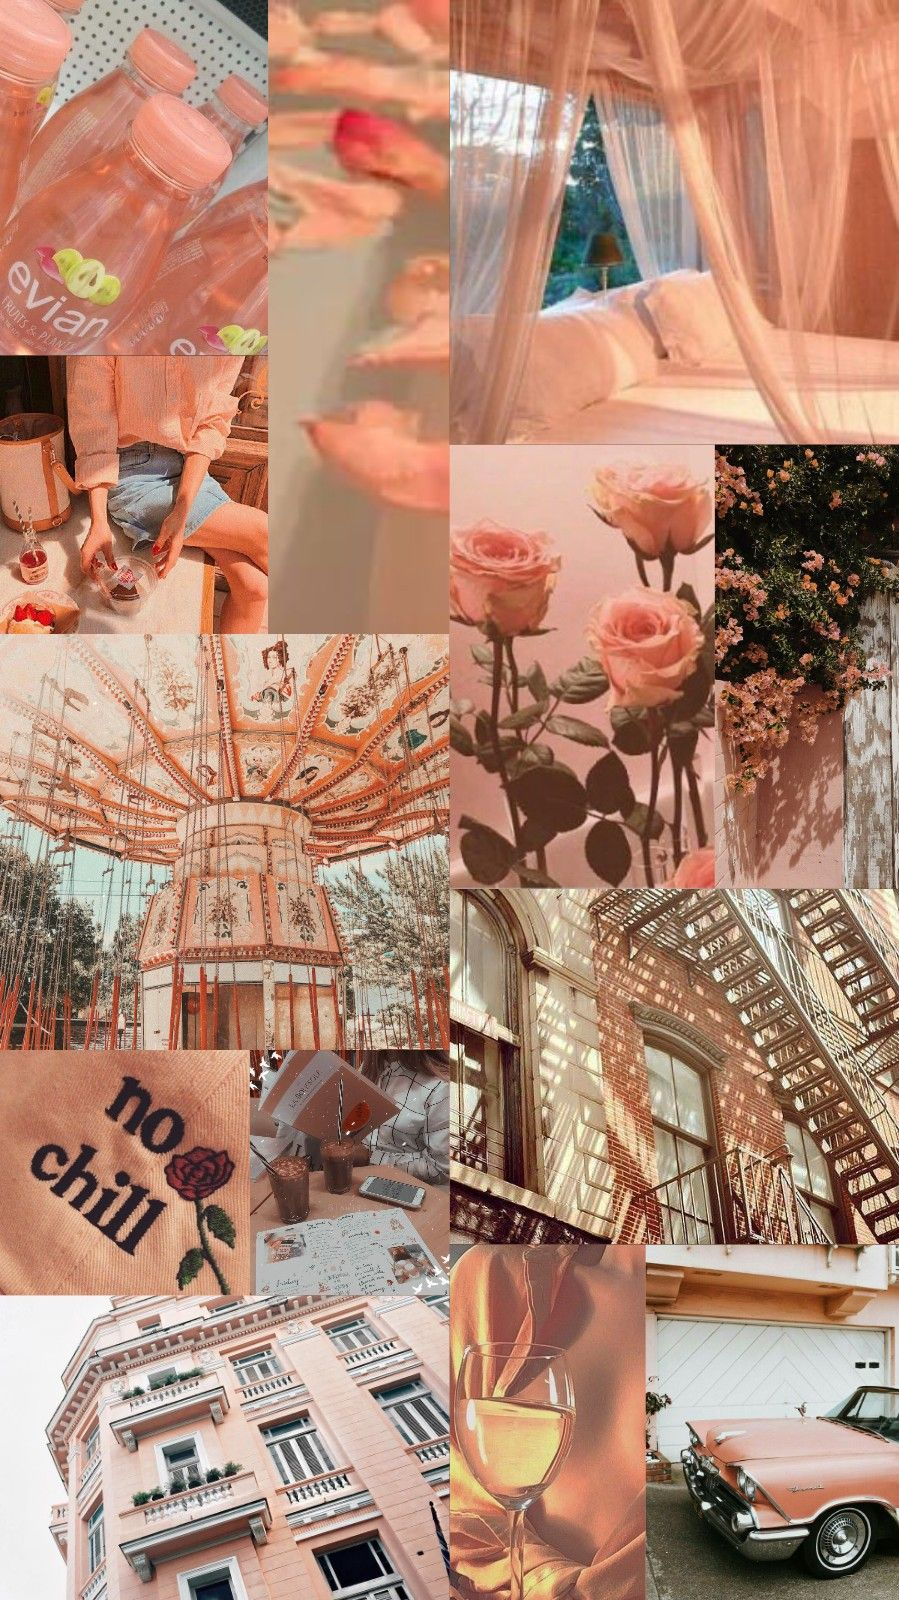 Aesthetic Collage Wallpaper Peach 2974922   HD Wallpaper 899x1600